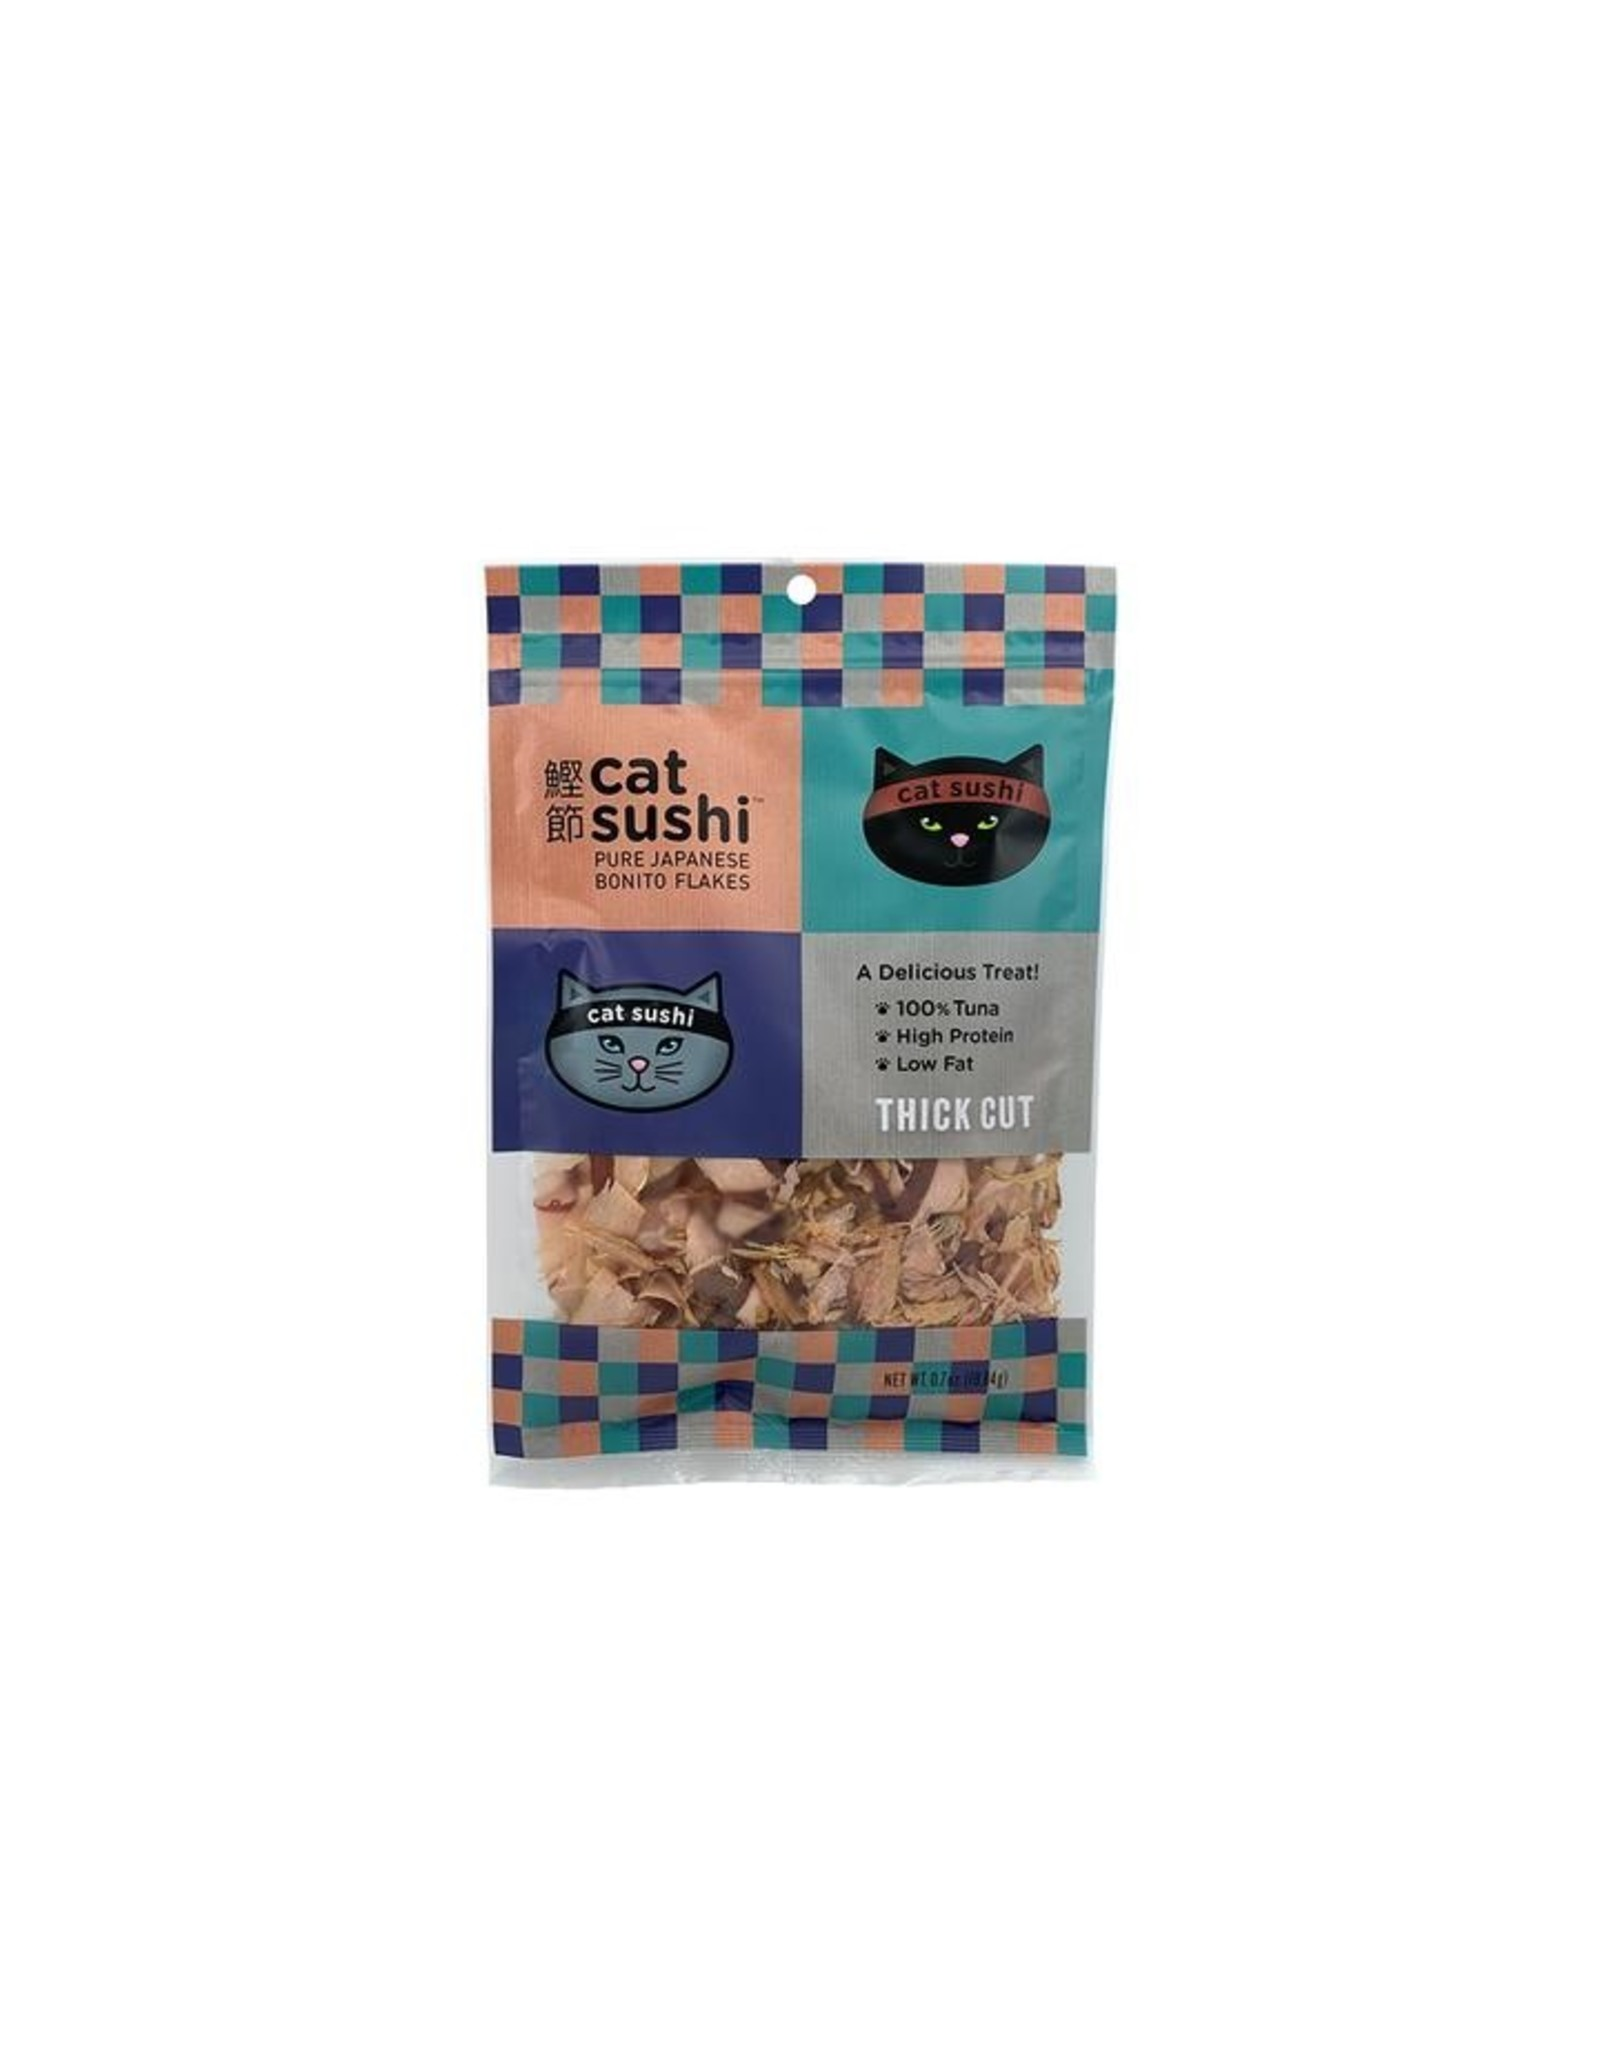 Cat Sushi: Japanese Bonito Flakes Thick Cut 0.7oz